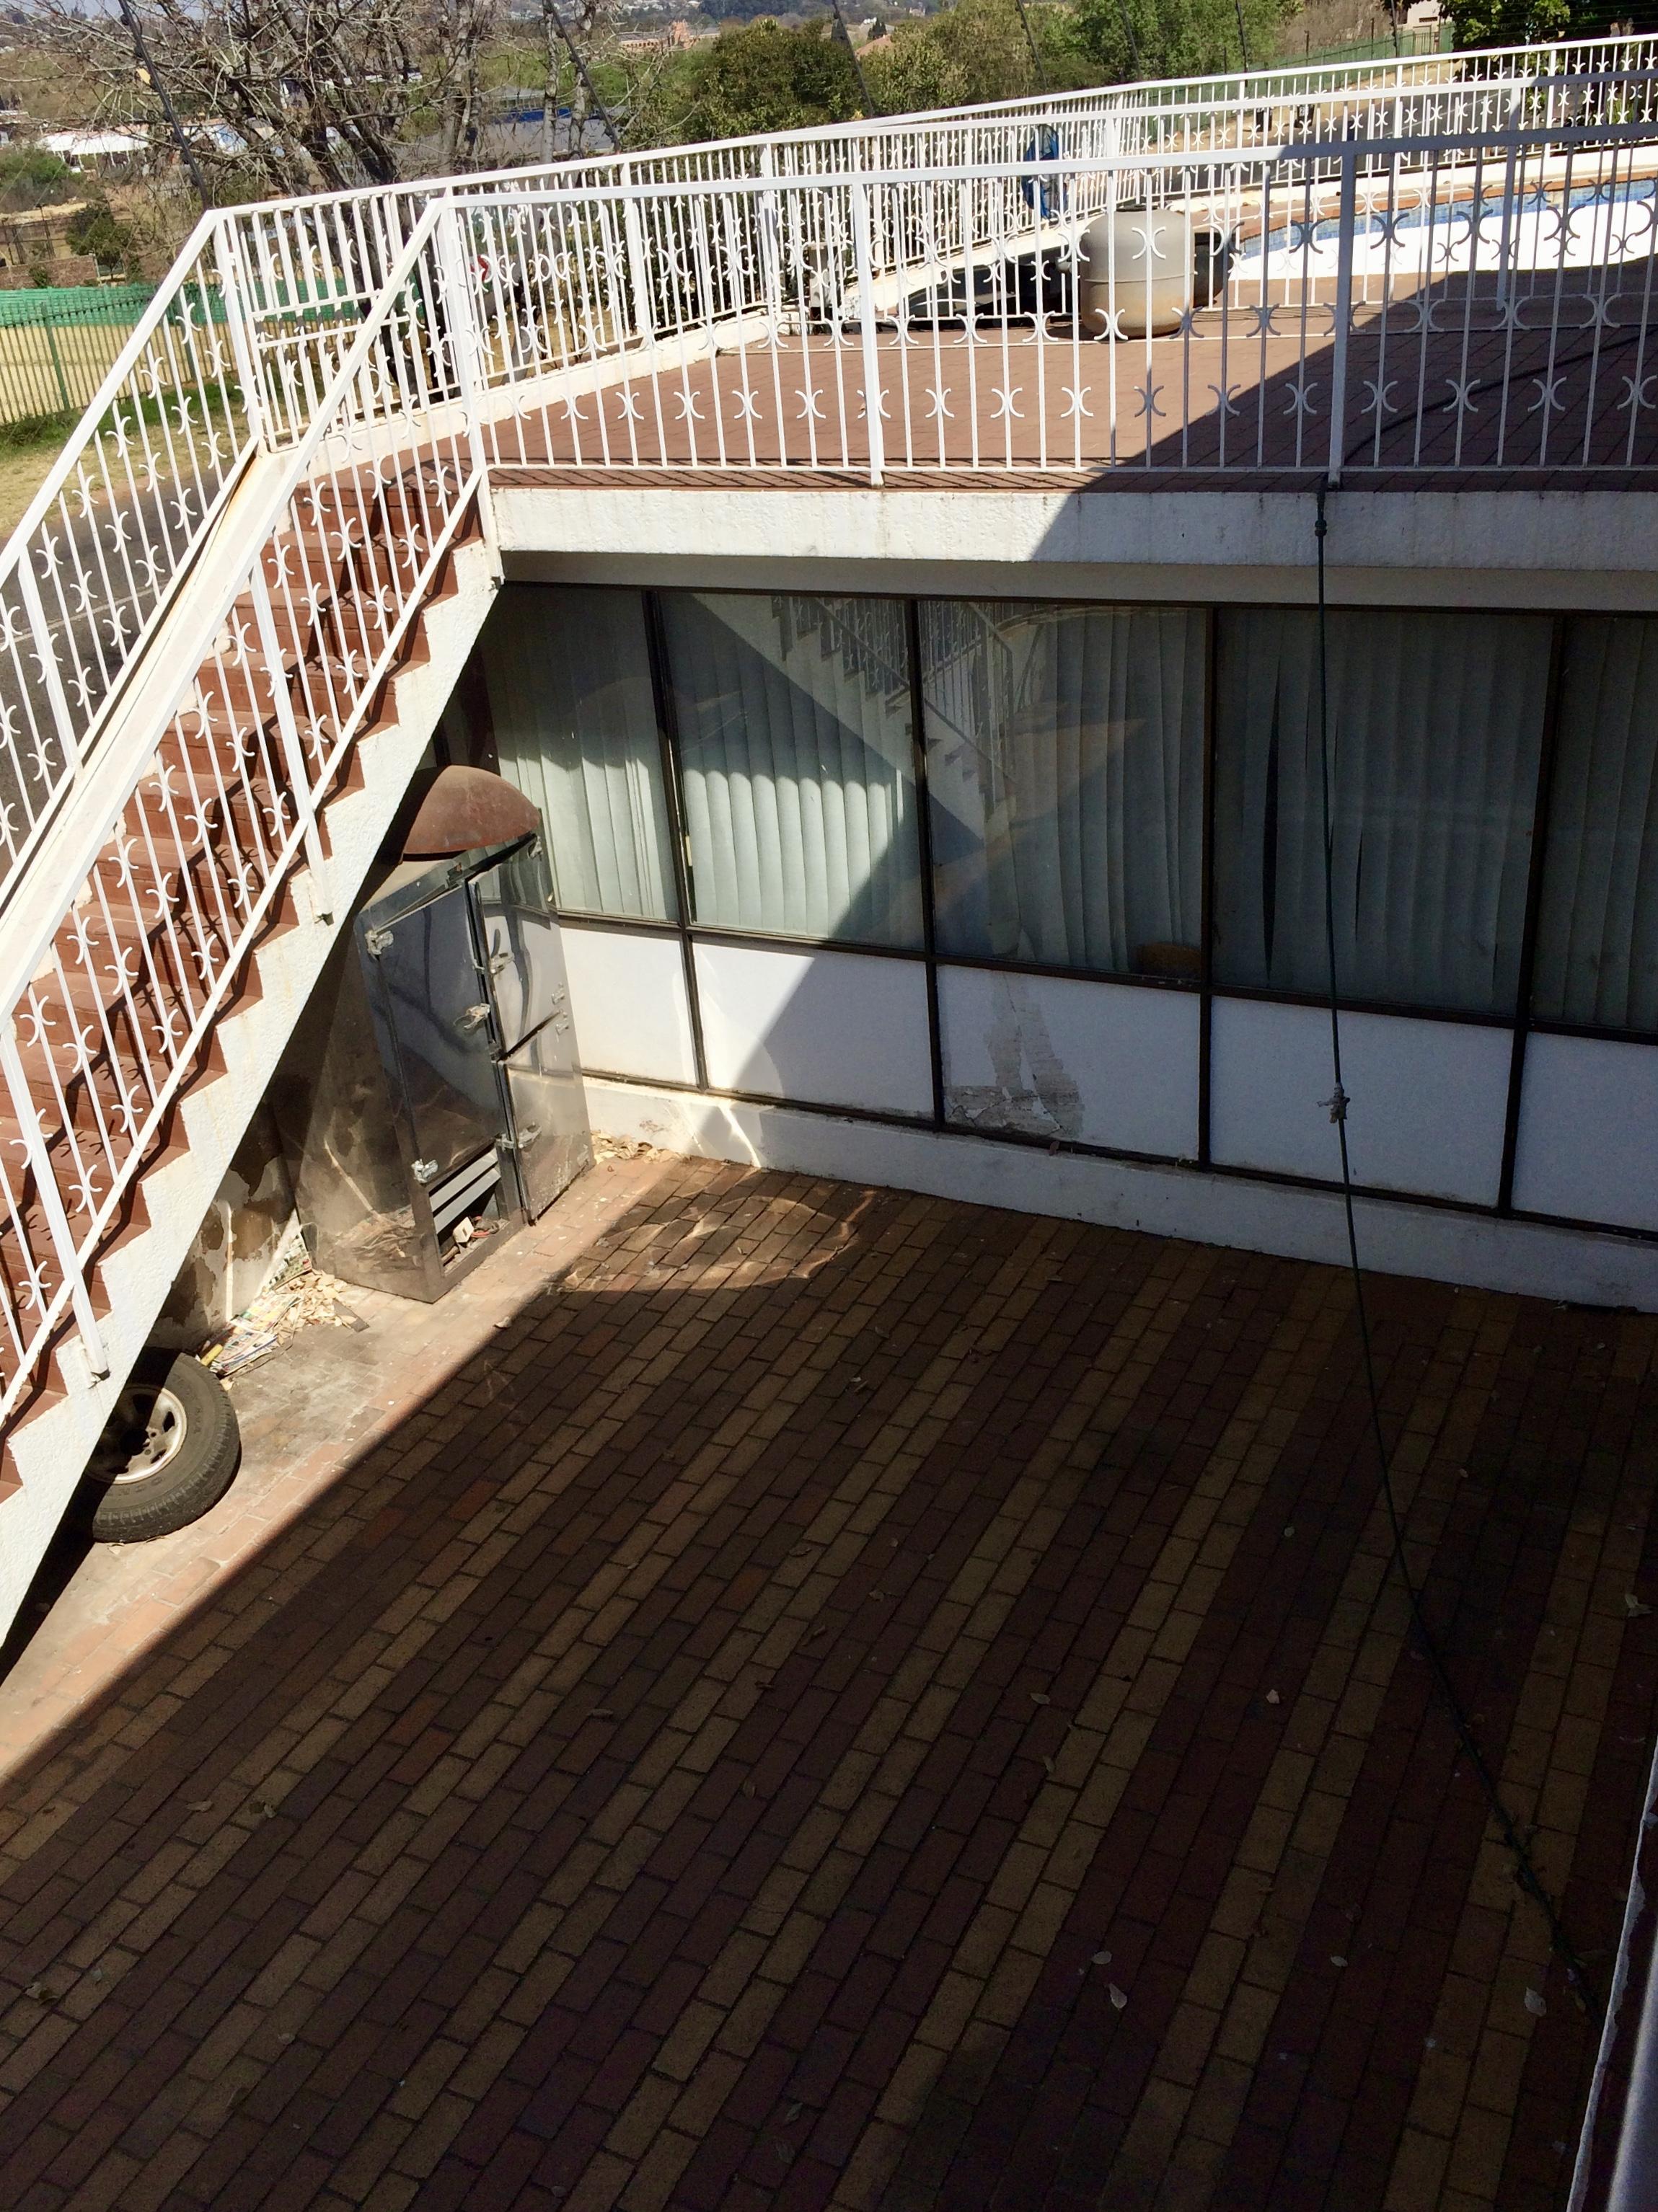 2 david drapper, Bruma, Gauteng, 4 Bedrooms Bedrooms, ,3 BathroomsBathrooms,House,For sale,david drapper,1037